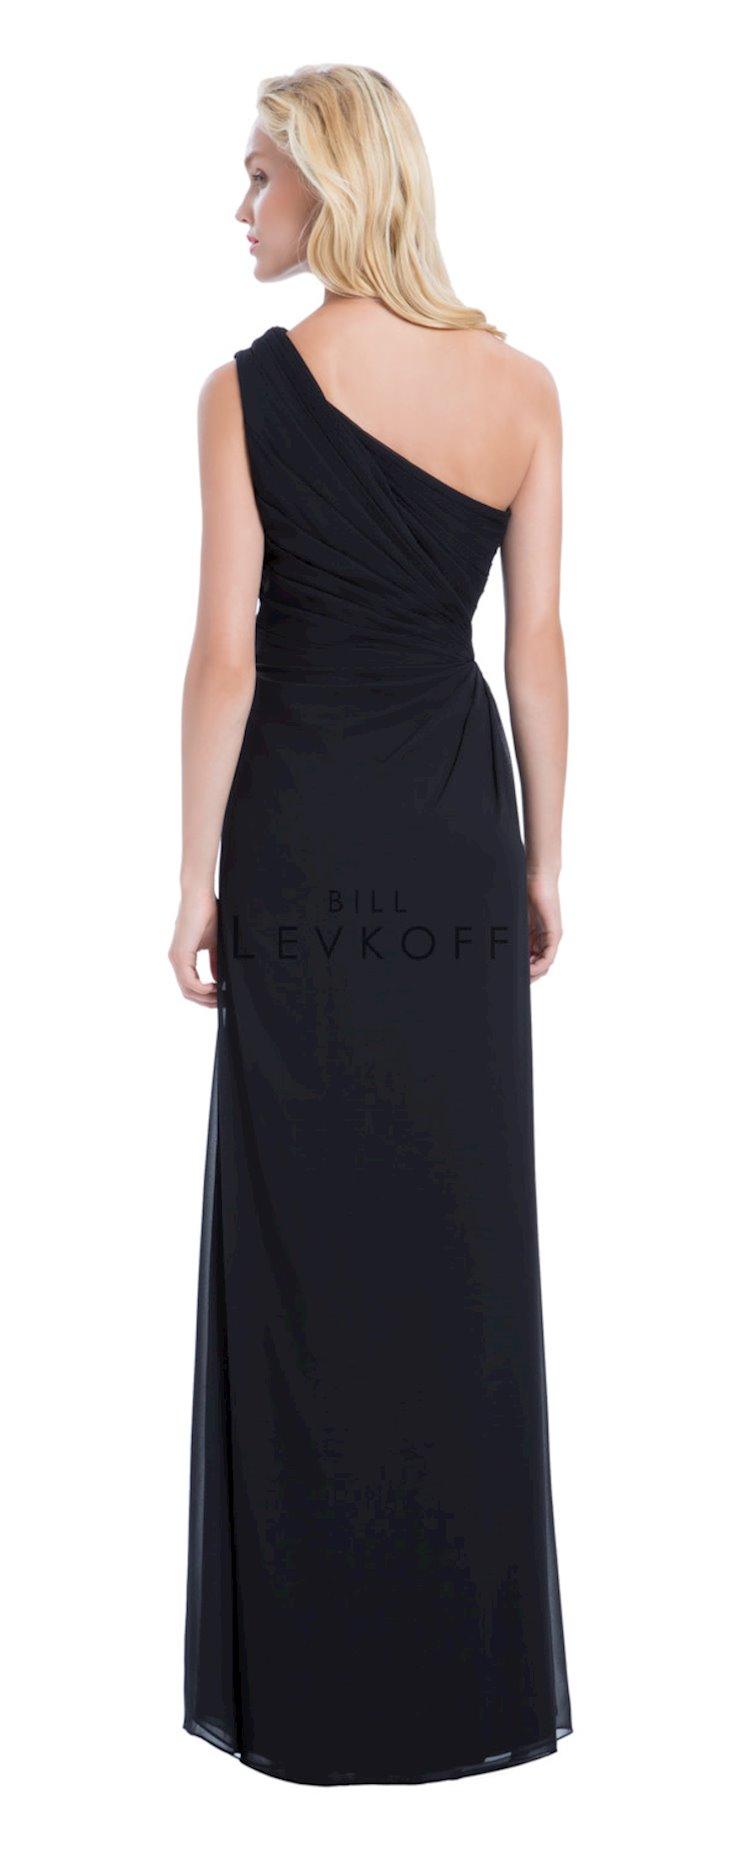 Bill Levkoff Style #1178